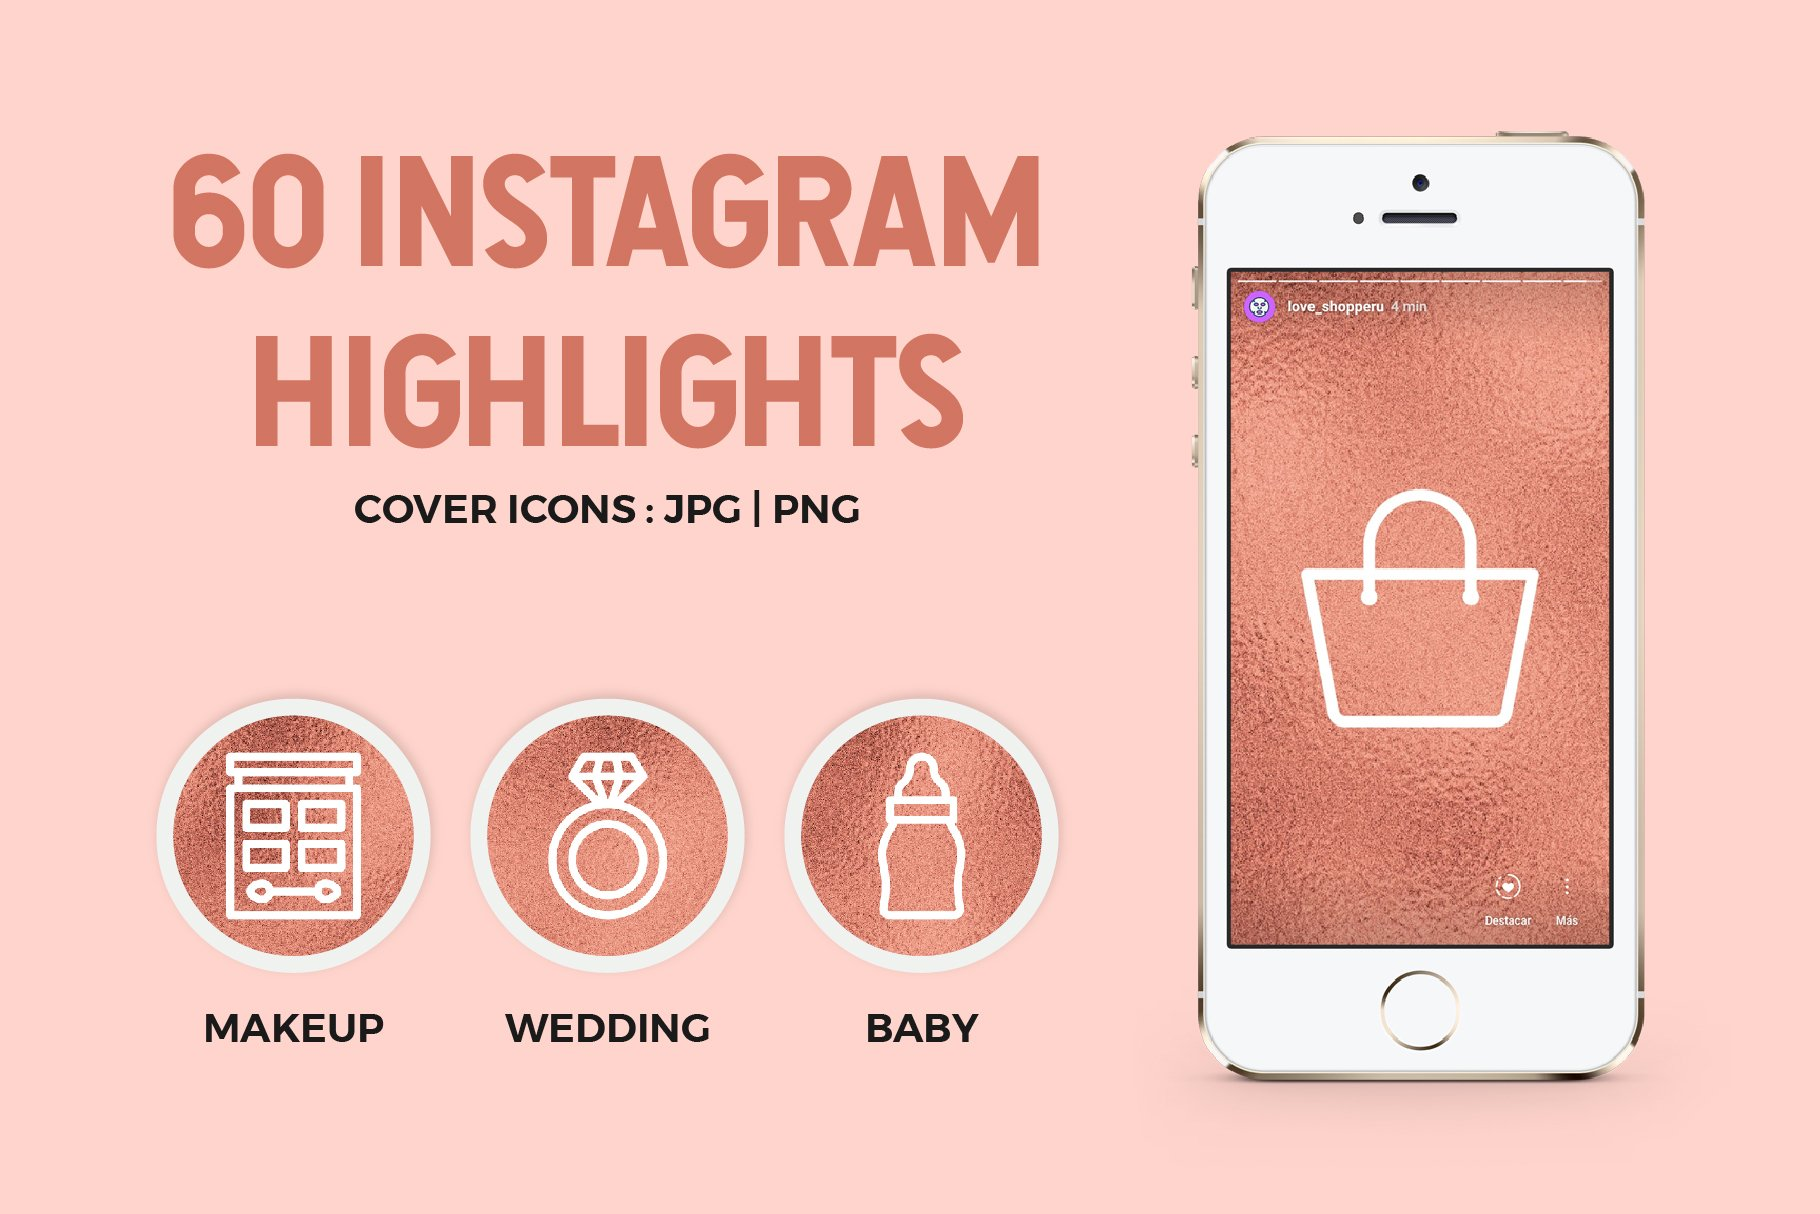 293 Rose Gold Glitter Social Media Icons branding kits and Instagram templates diy branding RGGB G25 Perfect for web design